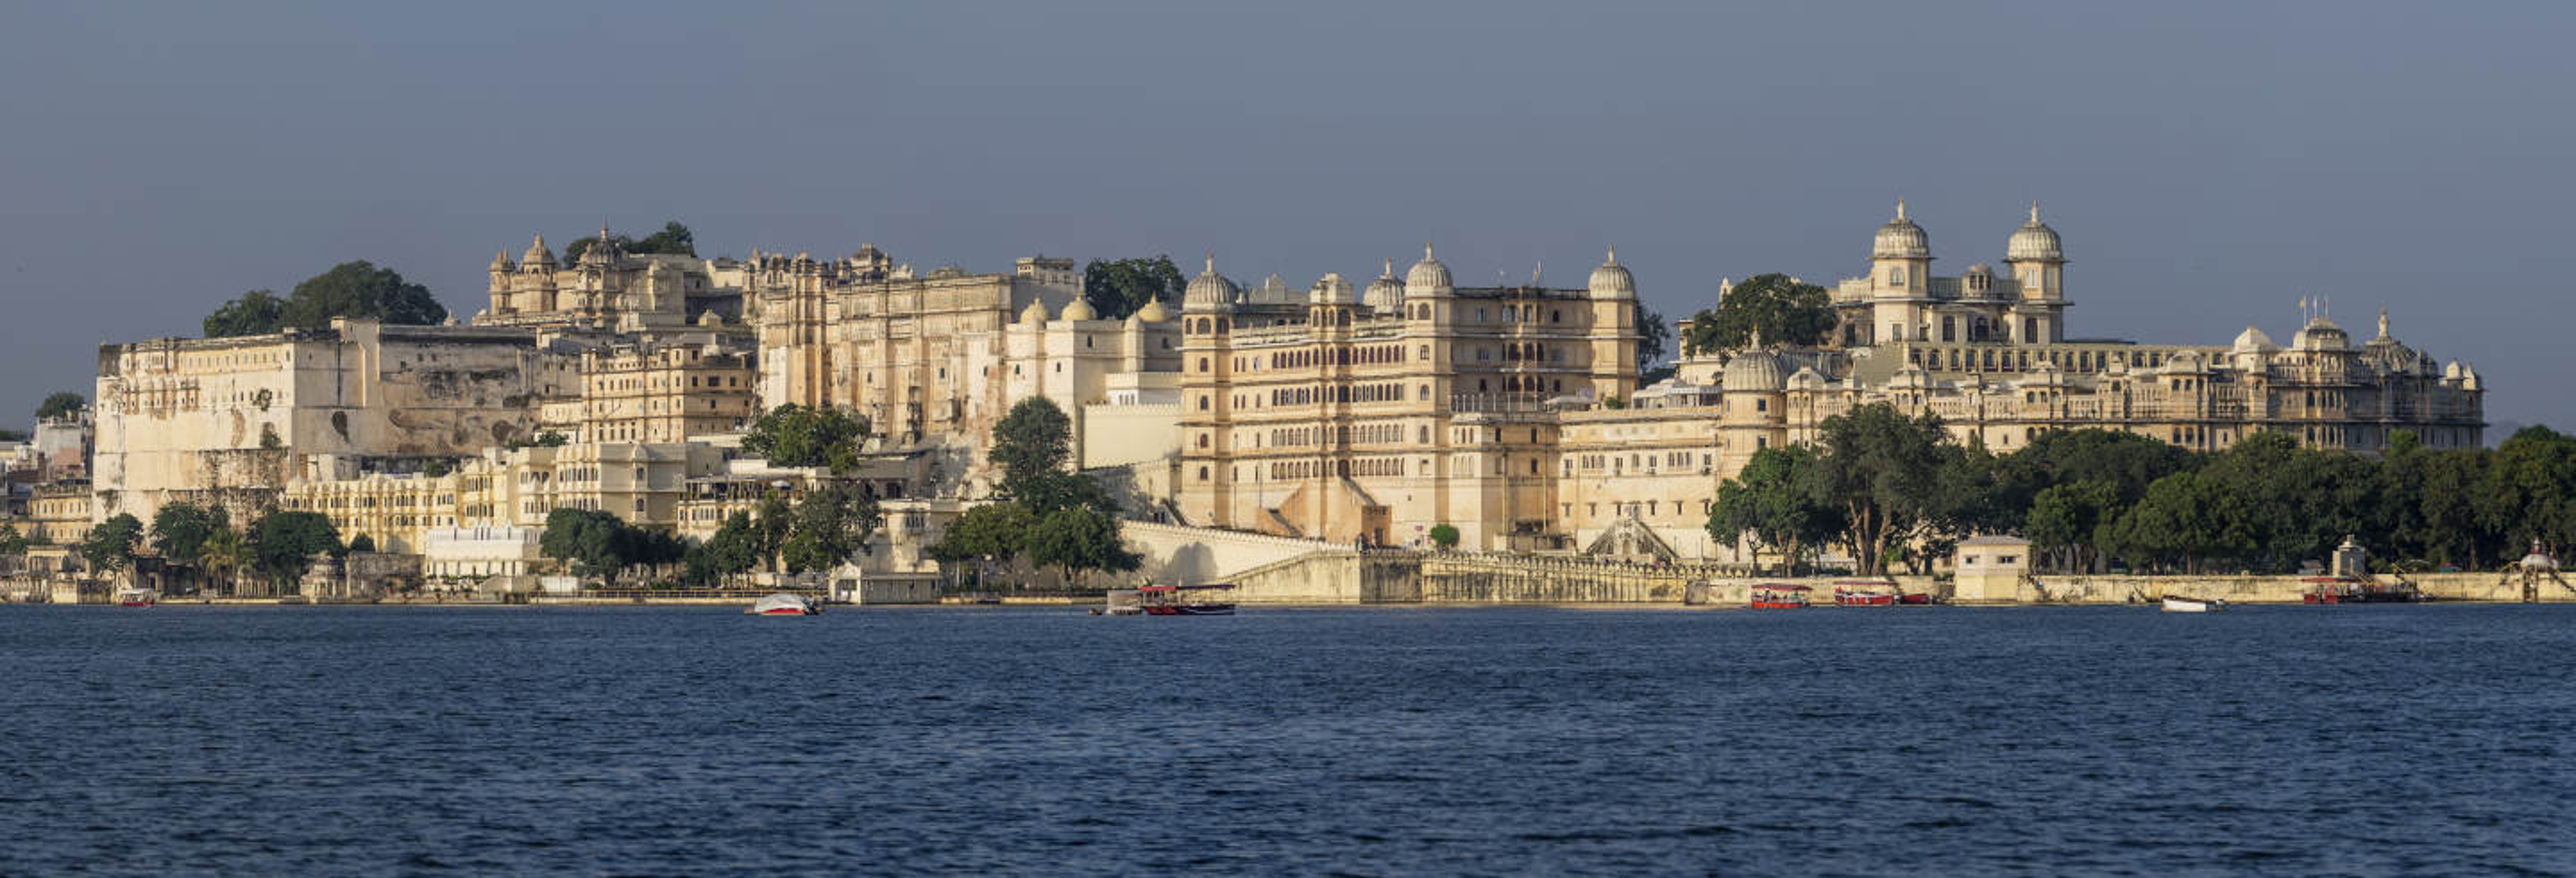 Tour privado por Udaipur con guía en español